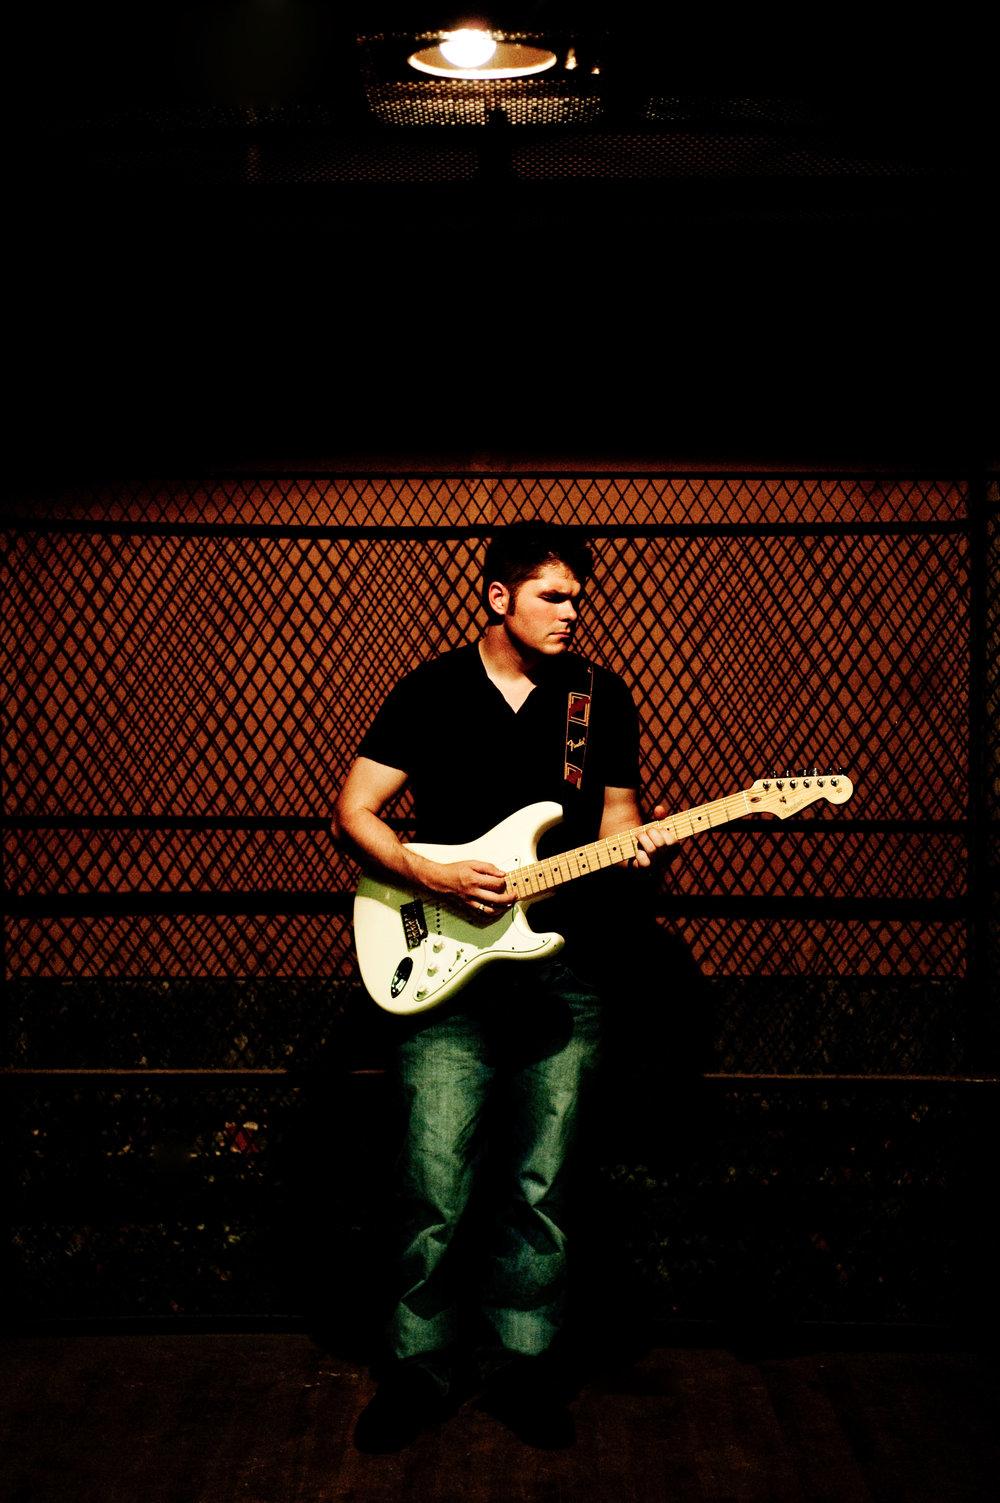 Marta-Hewson-editorial-portraits-electric-guitar-Andre-Bison.JPG